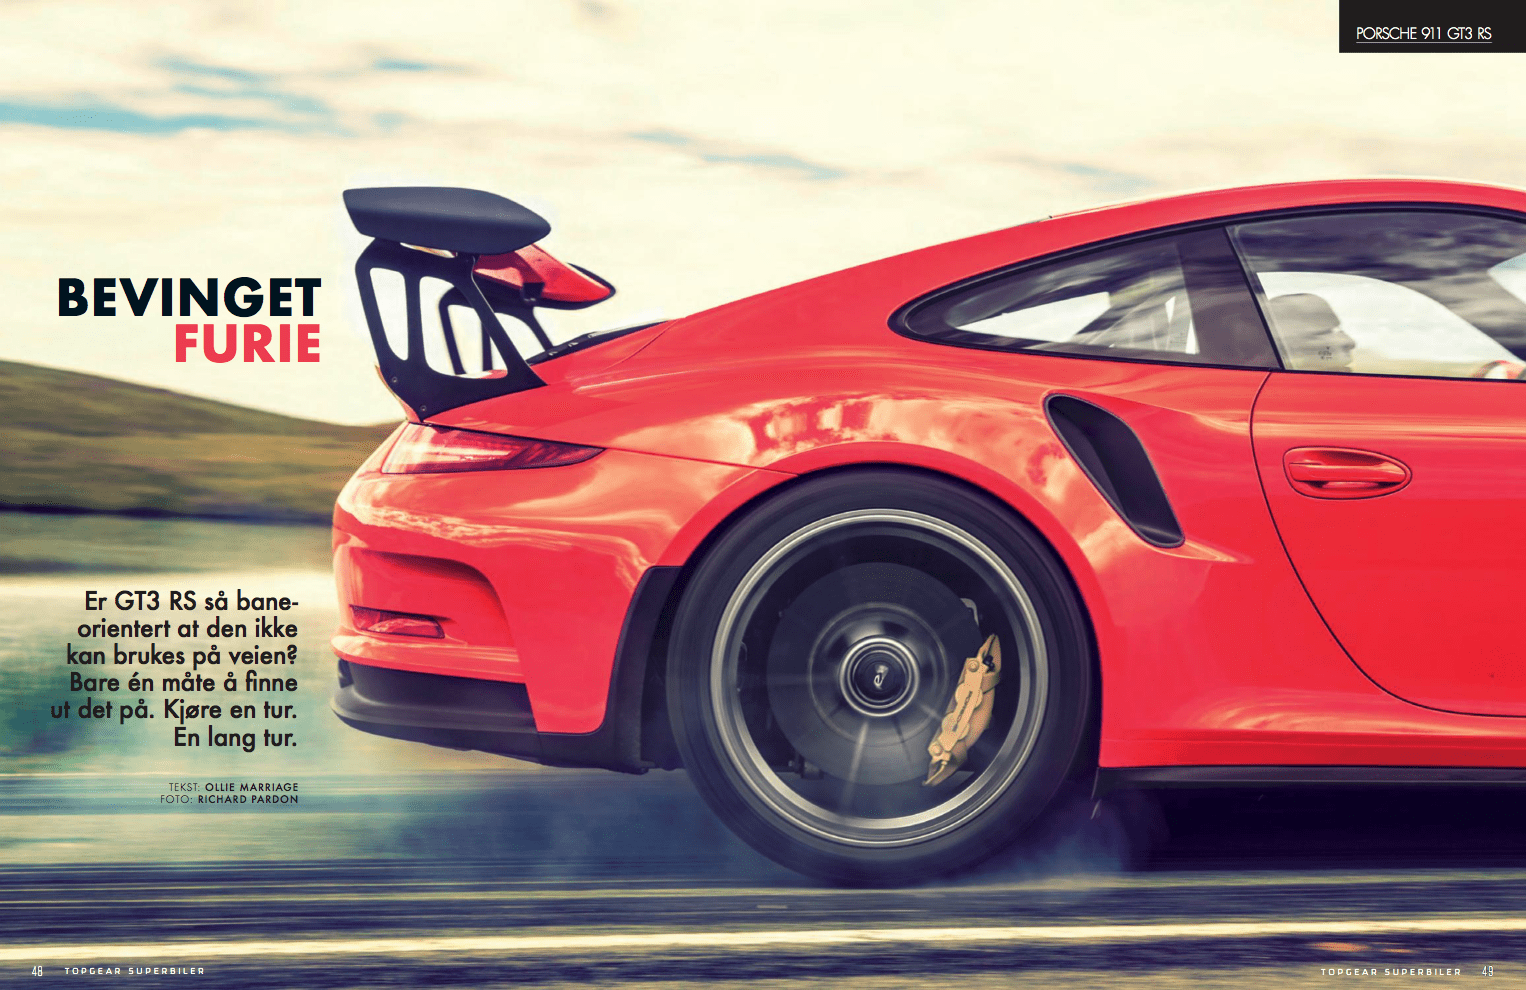 Bevinget furie – Porsche GT3 RS